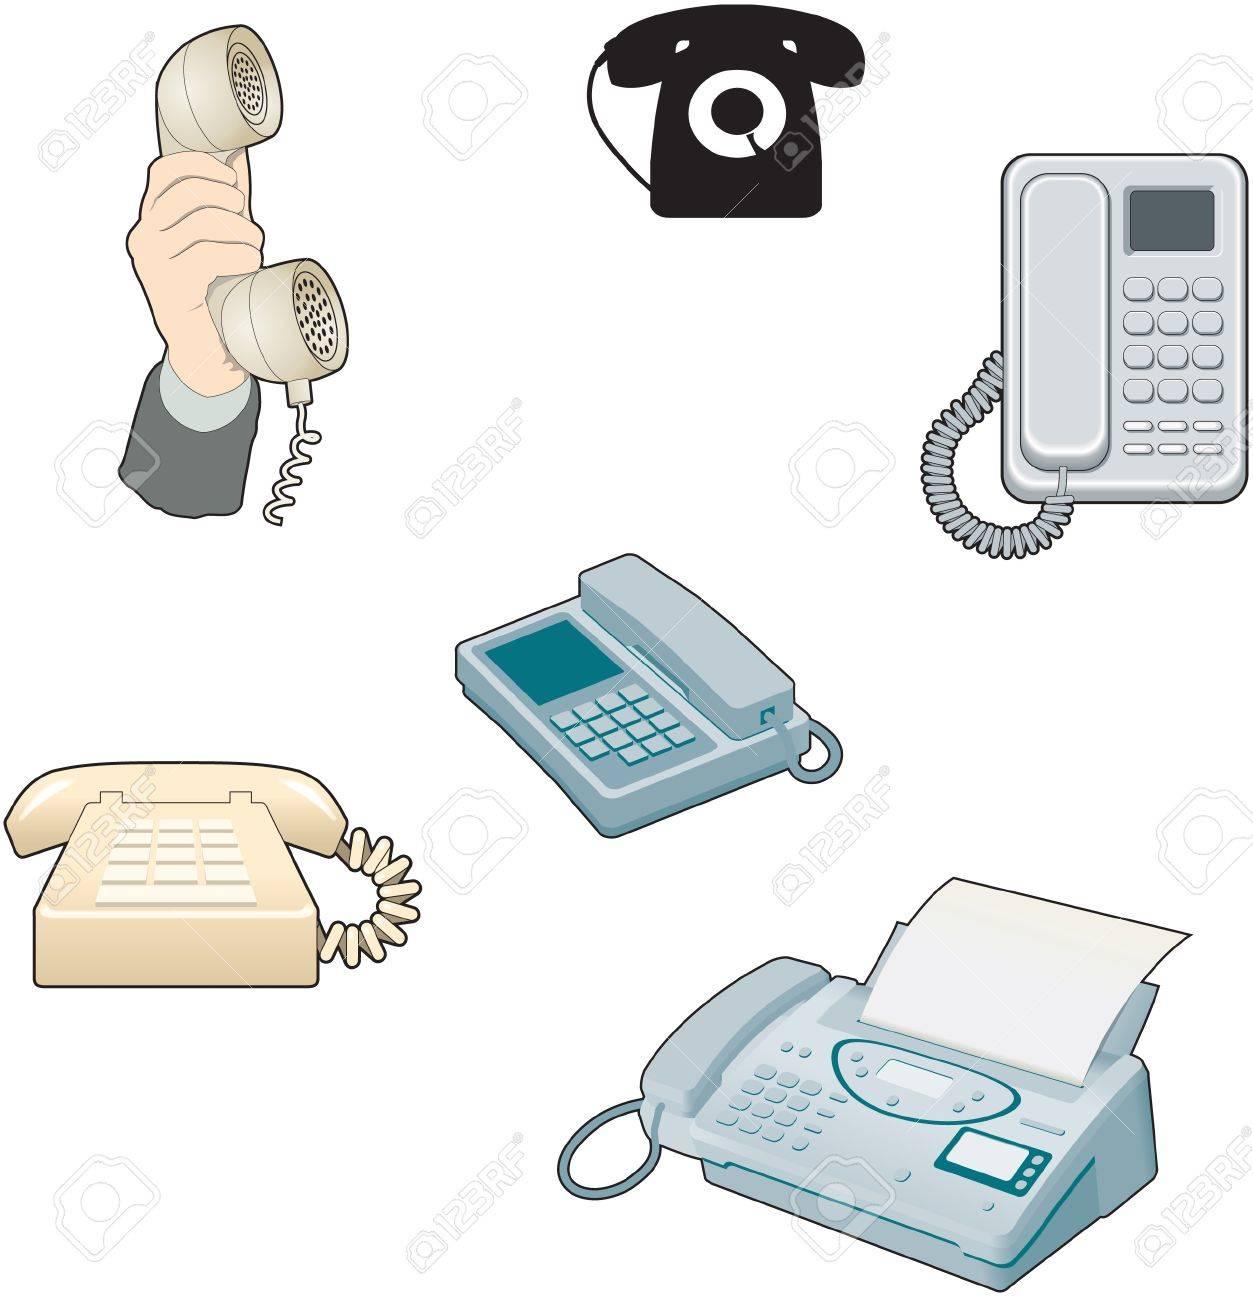 old phone wiring diagram on boston matrix diagram Telephone Wiring Basics  Telephone Wiring Color Code Telephone Wiring 101 DSL Phone Line Wiring Diagram